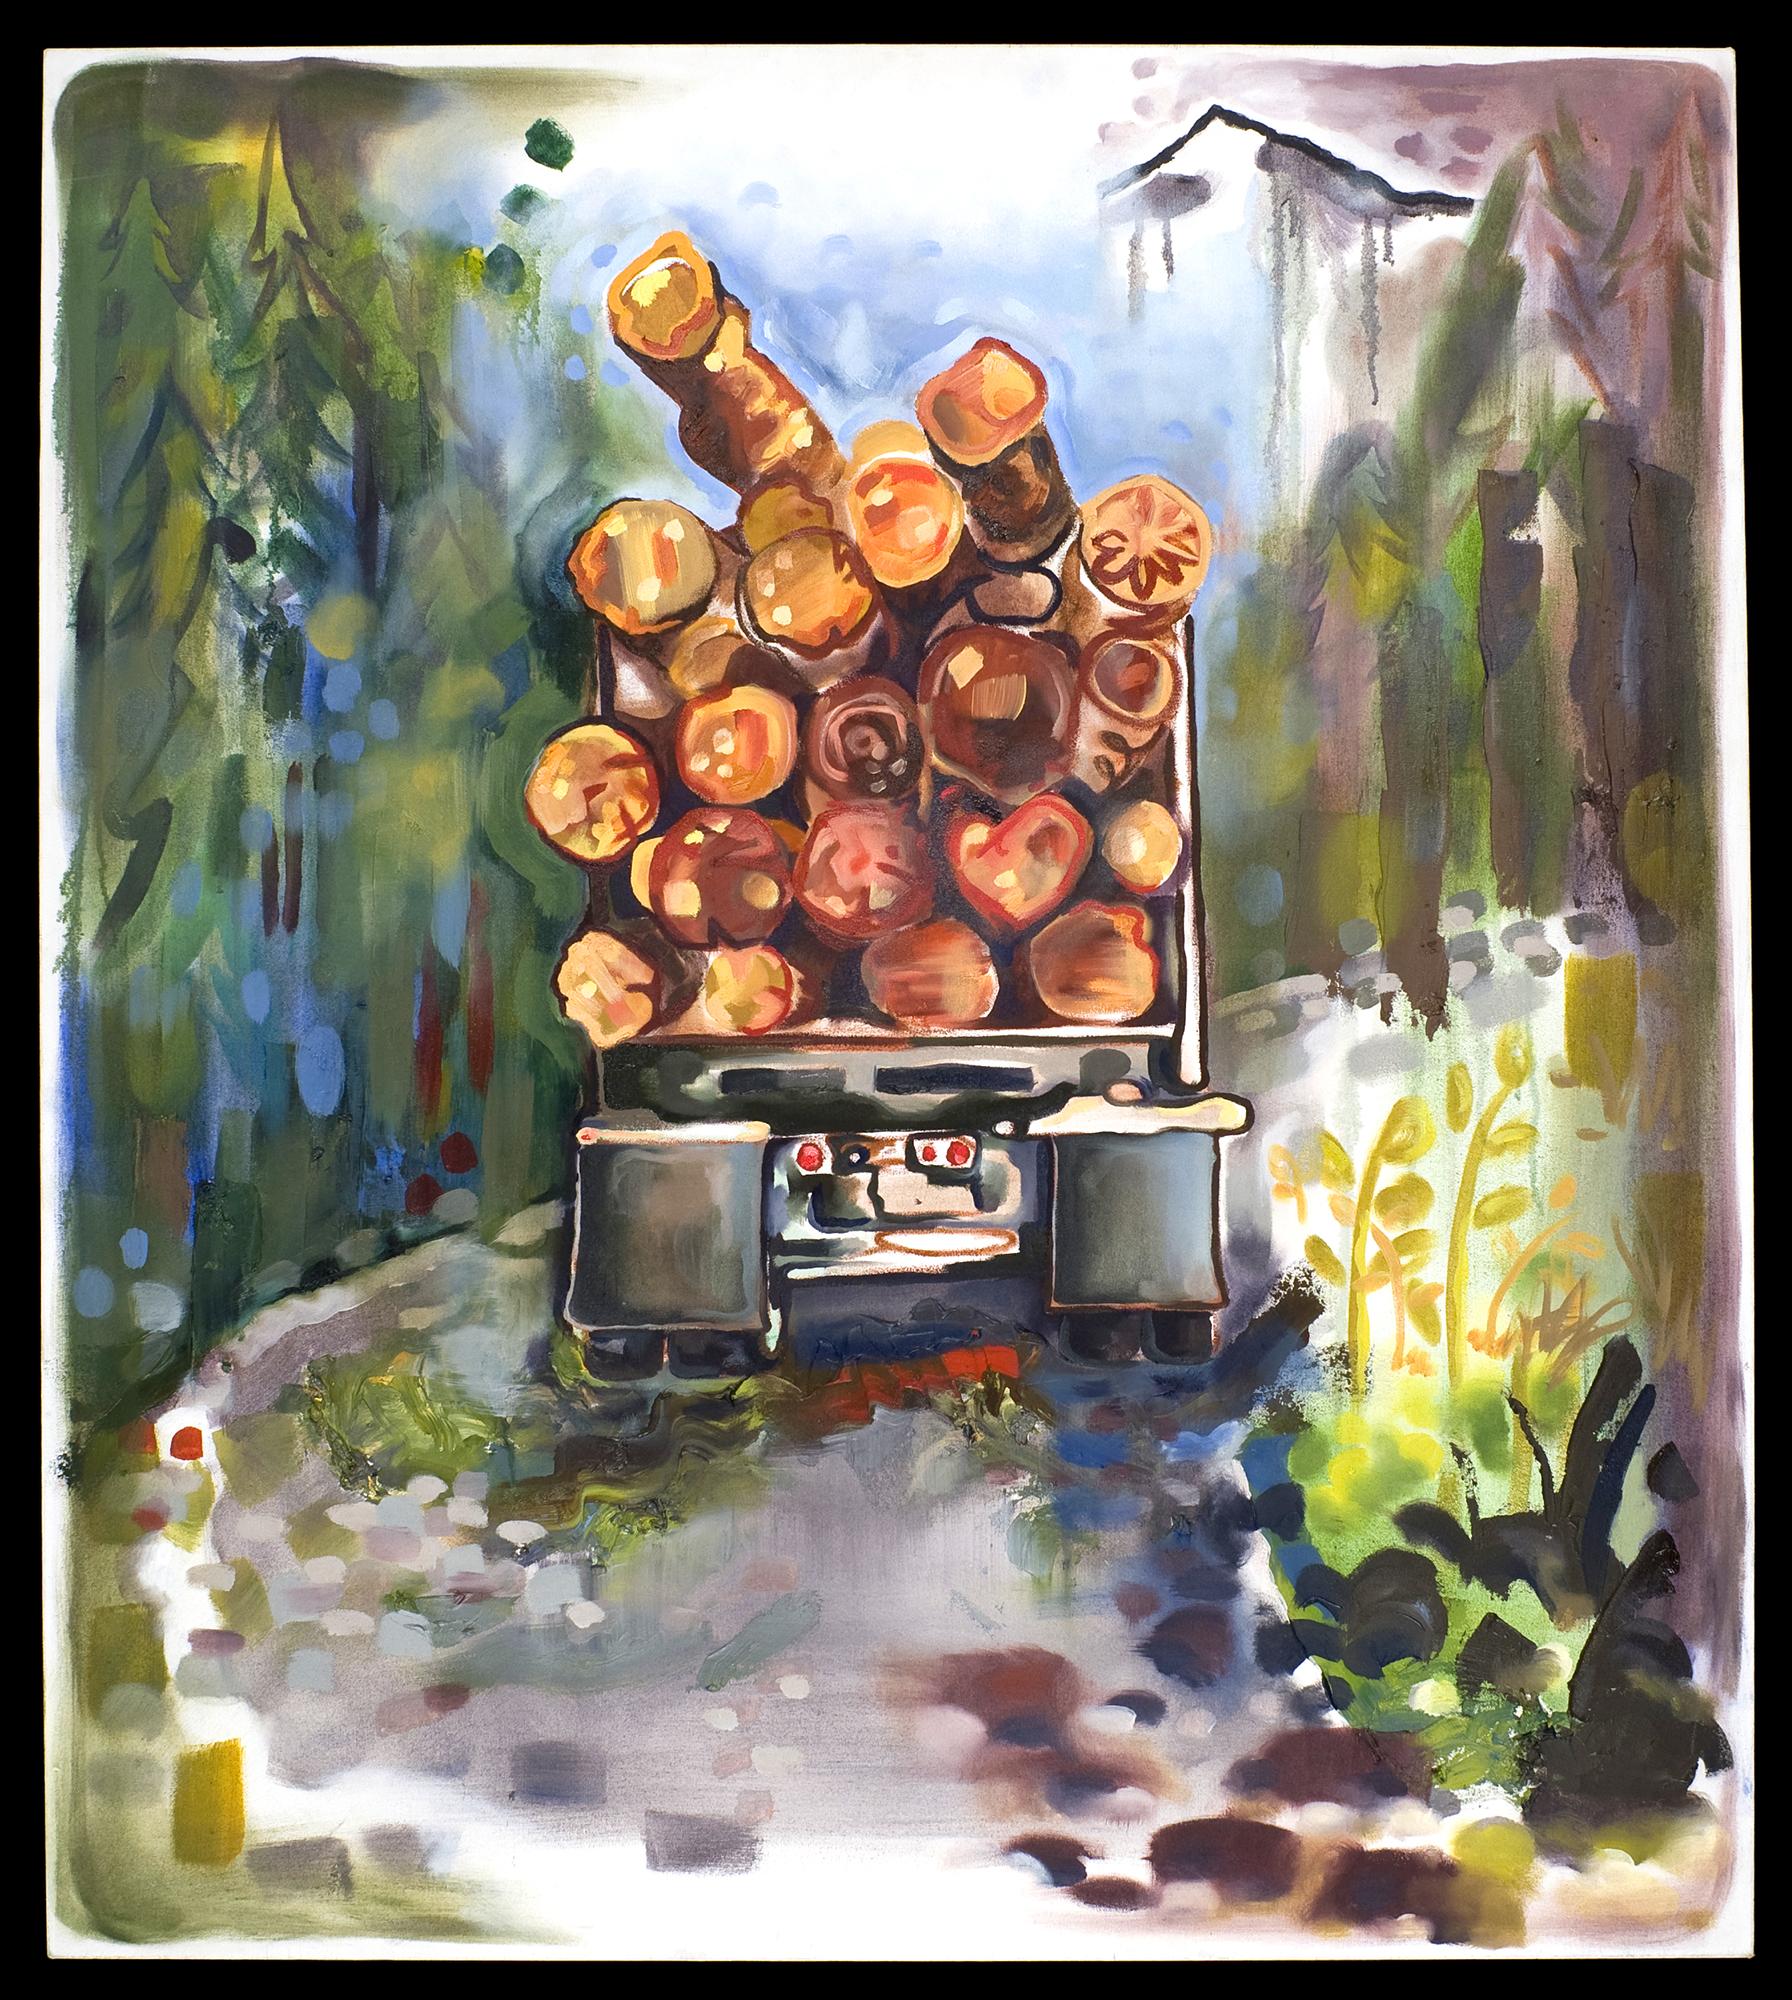 Death Drives a Logging Truck